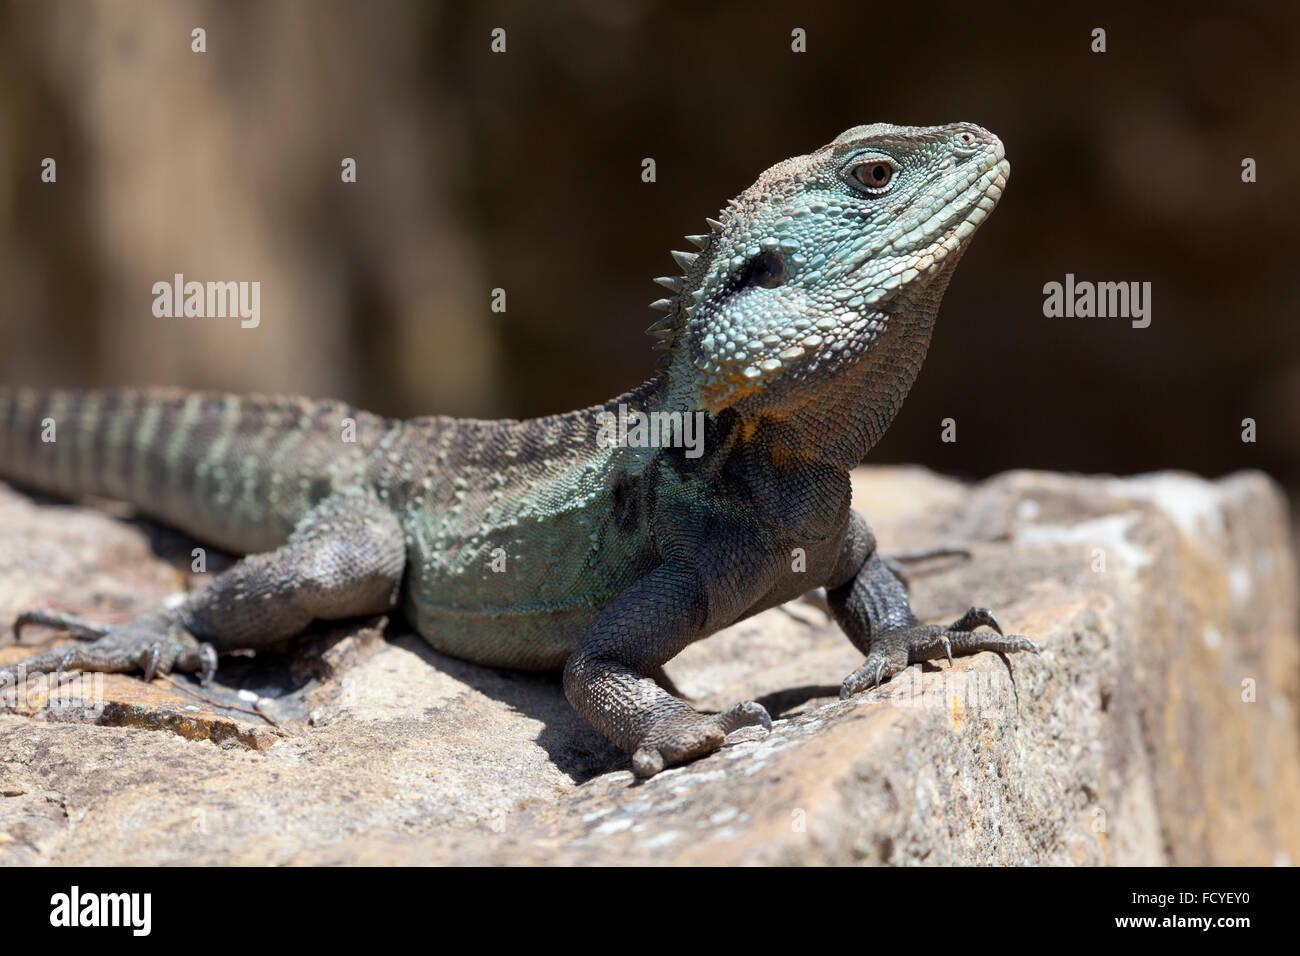 Eastern Water Dragon, Queensland, Australia - Stock Image